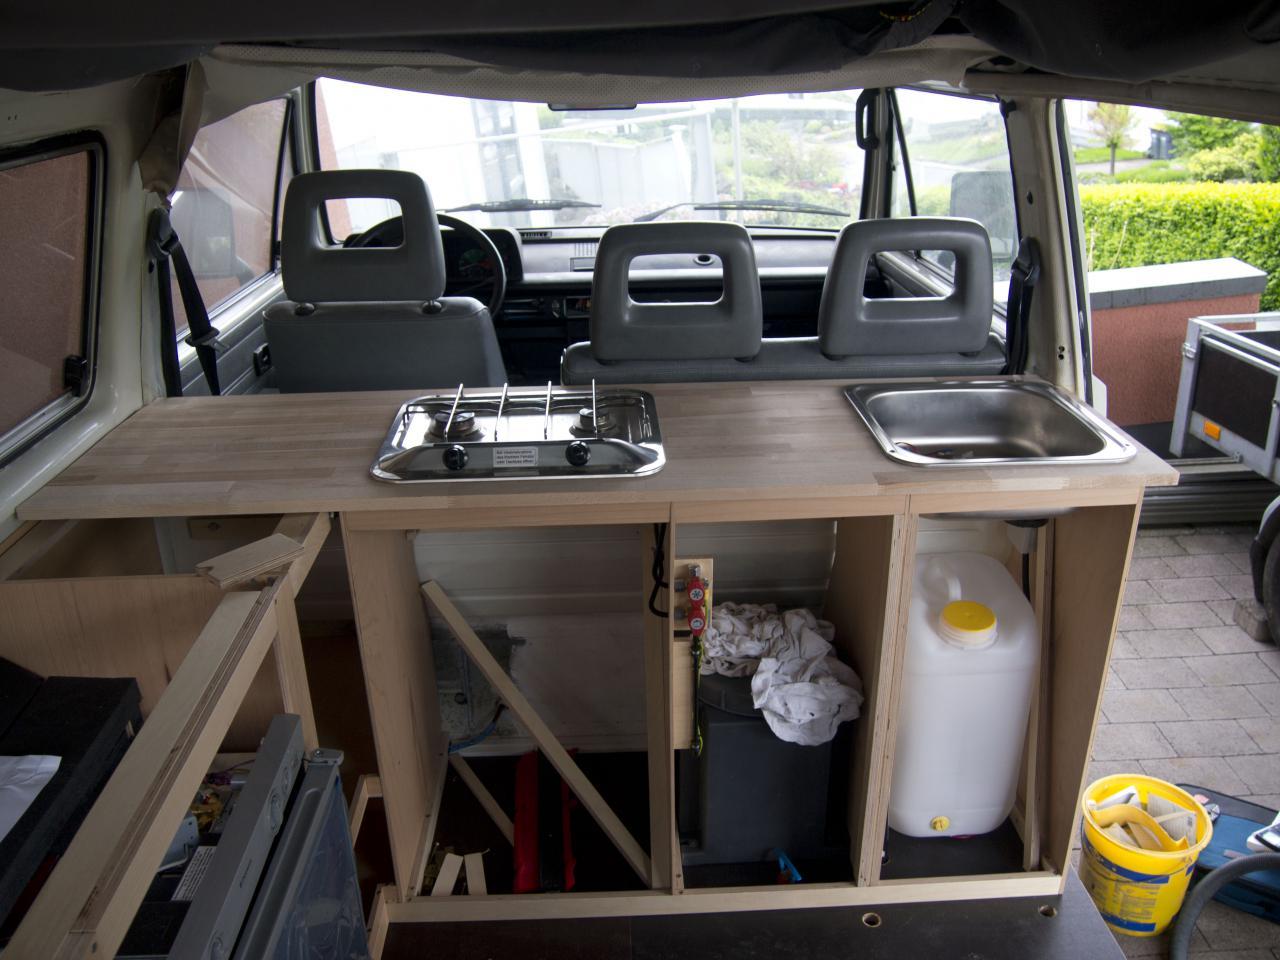 spacecamper classic der vw t6 camping ausbau t4 k che. Black Bedroom Furniture Sets. Home Design Ideas